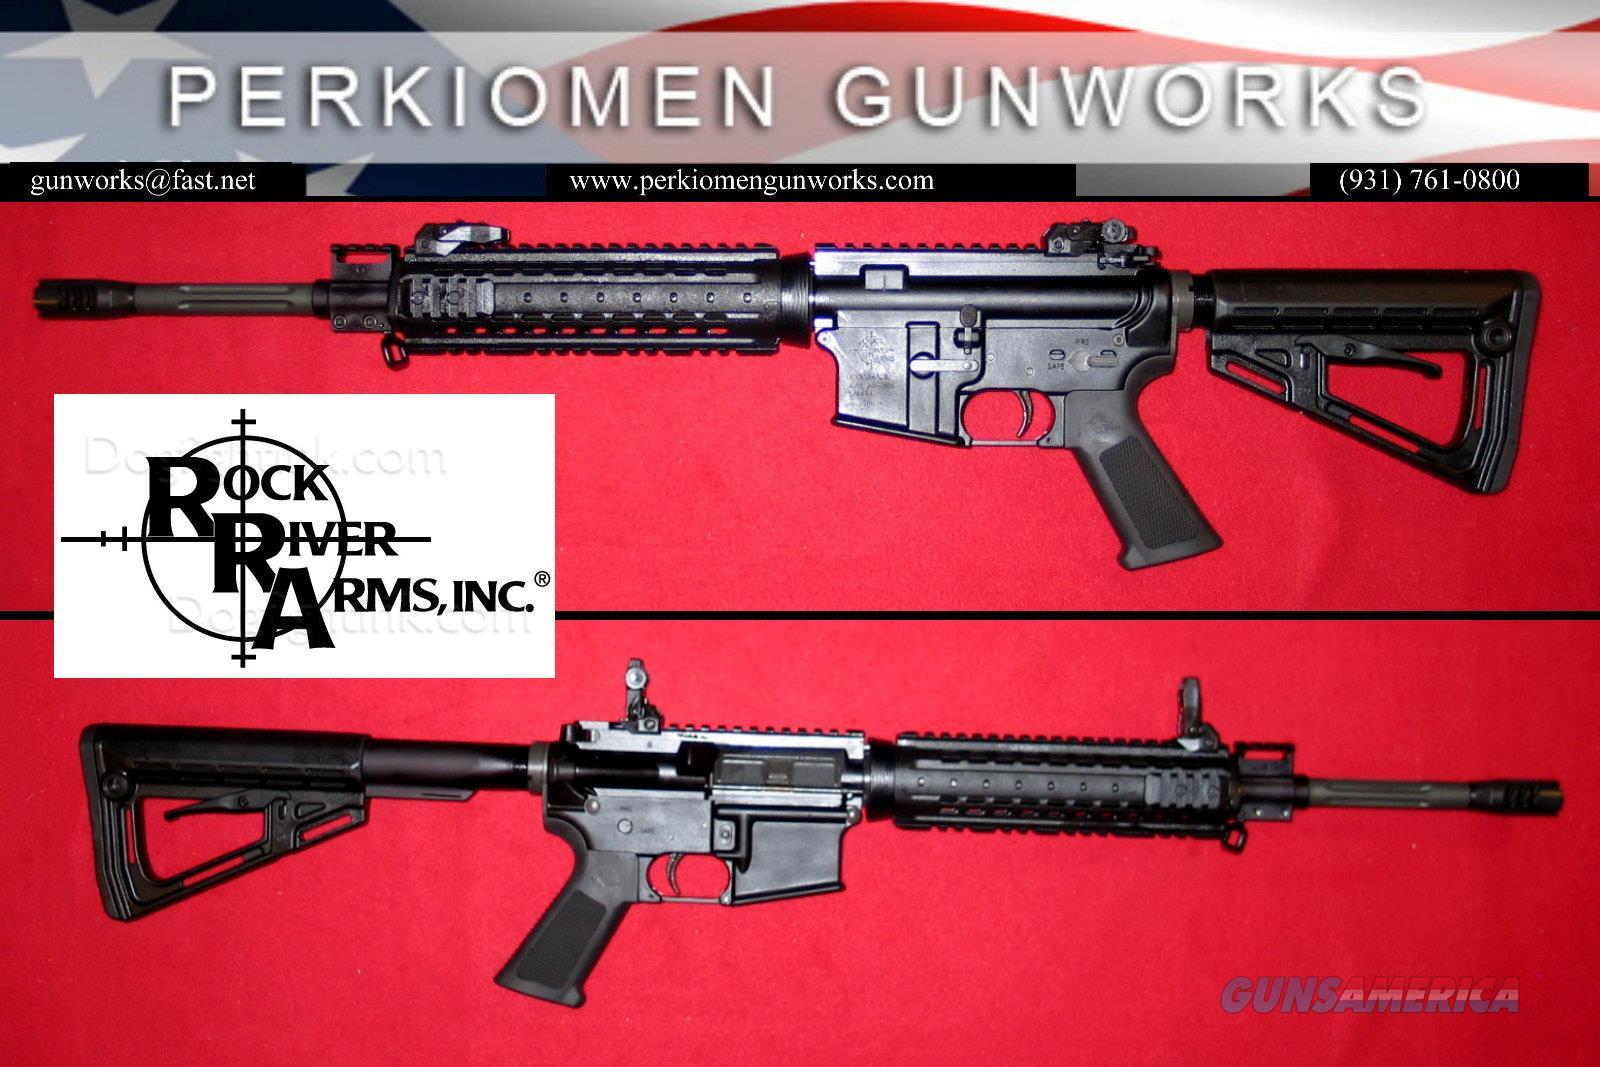 NSP Mid-Length Carbine, 16 inch, 5.56/.223, AR1425, New w/RRA hard case   Guns > Rifles > Rock River Arms Rifles